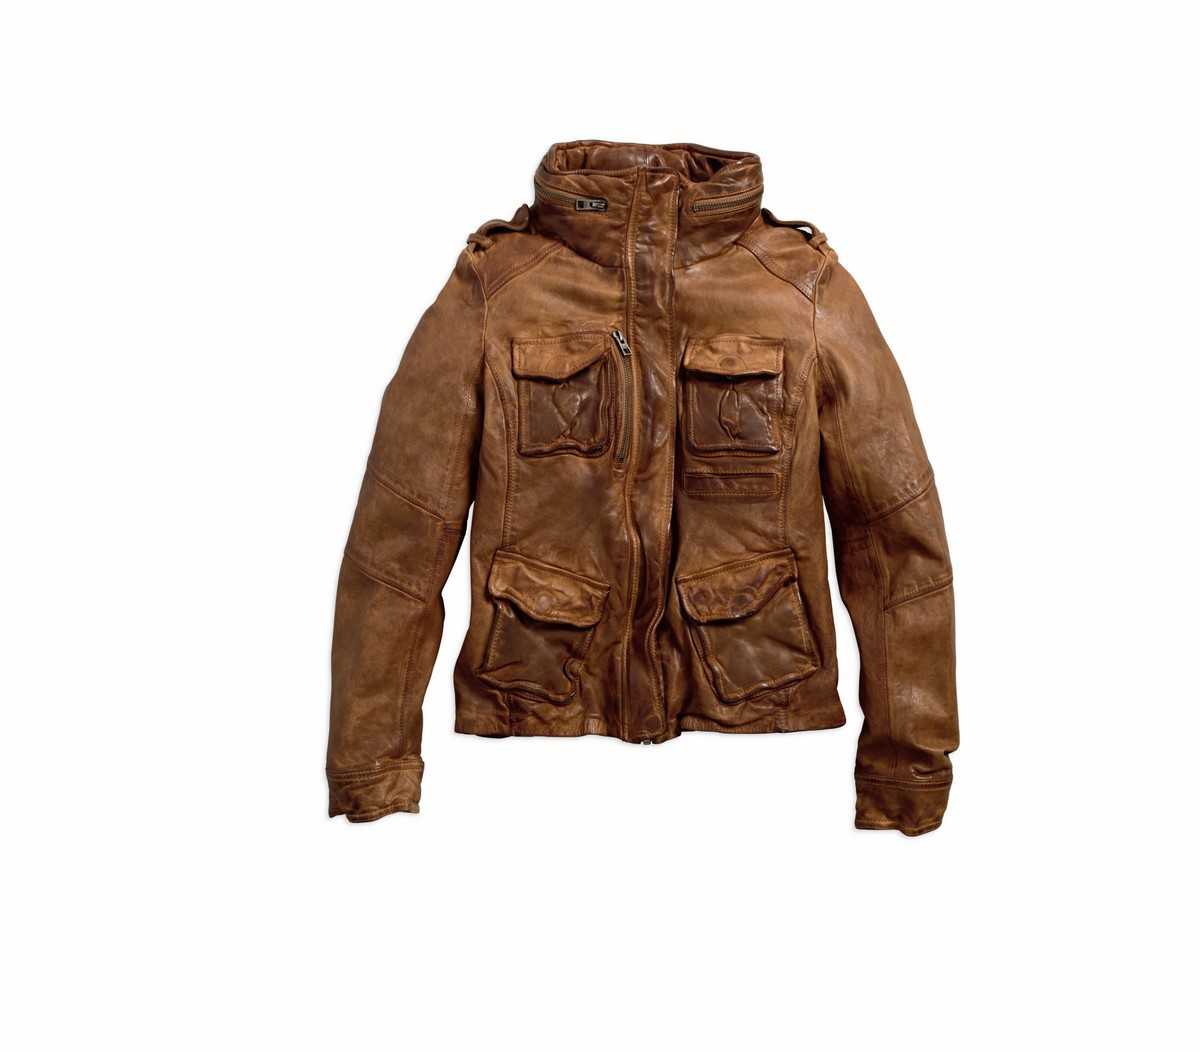 Women's Mocha Bisque Brown Vintage Leather Fashion Jacket